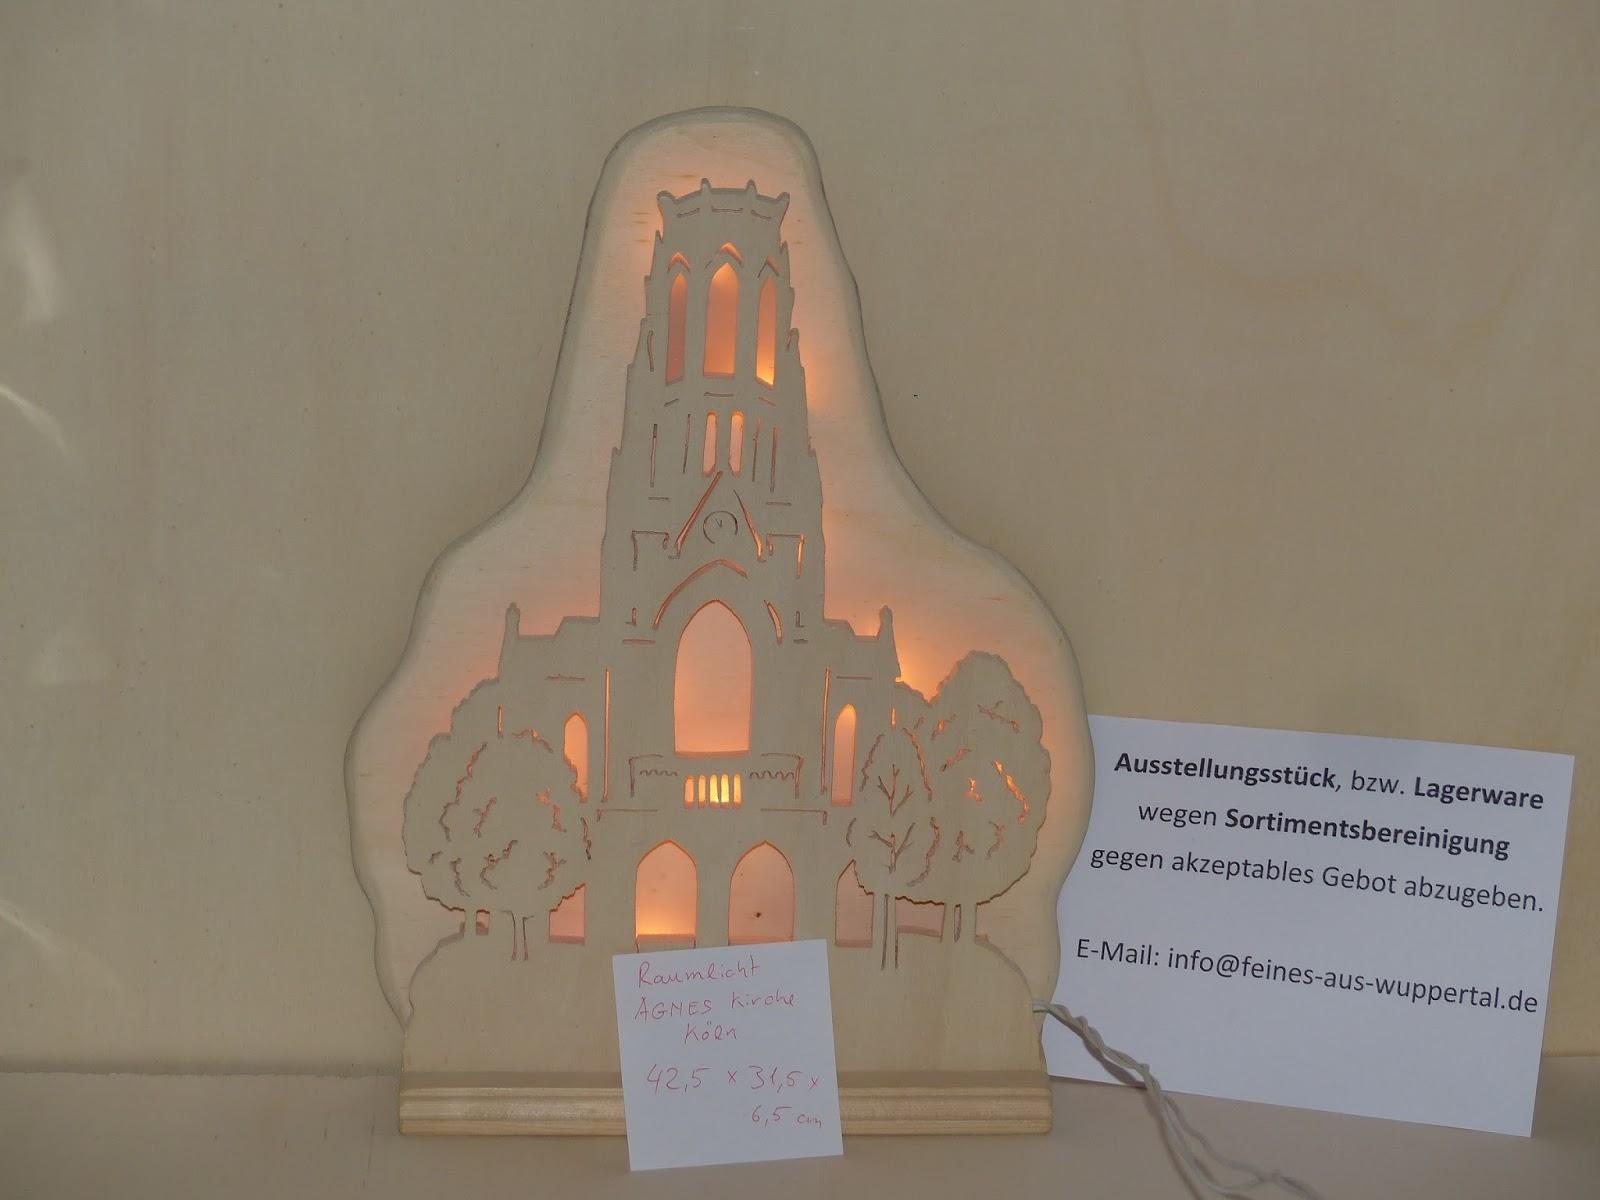 St. Agnes Kirche Köln als beleuchtetes Wandbild aus Holz ...